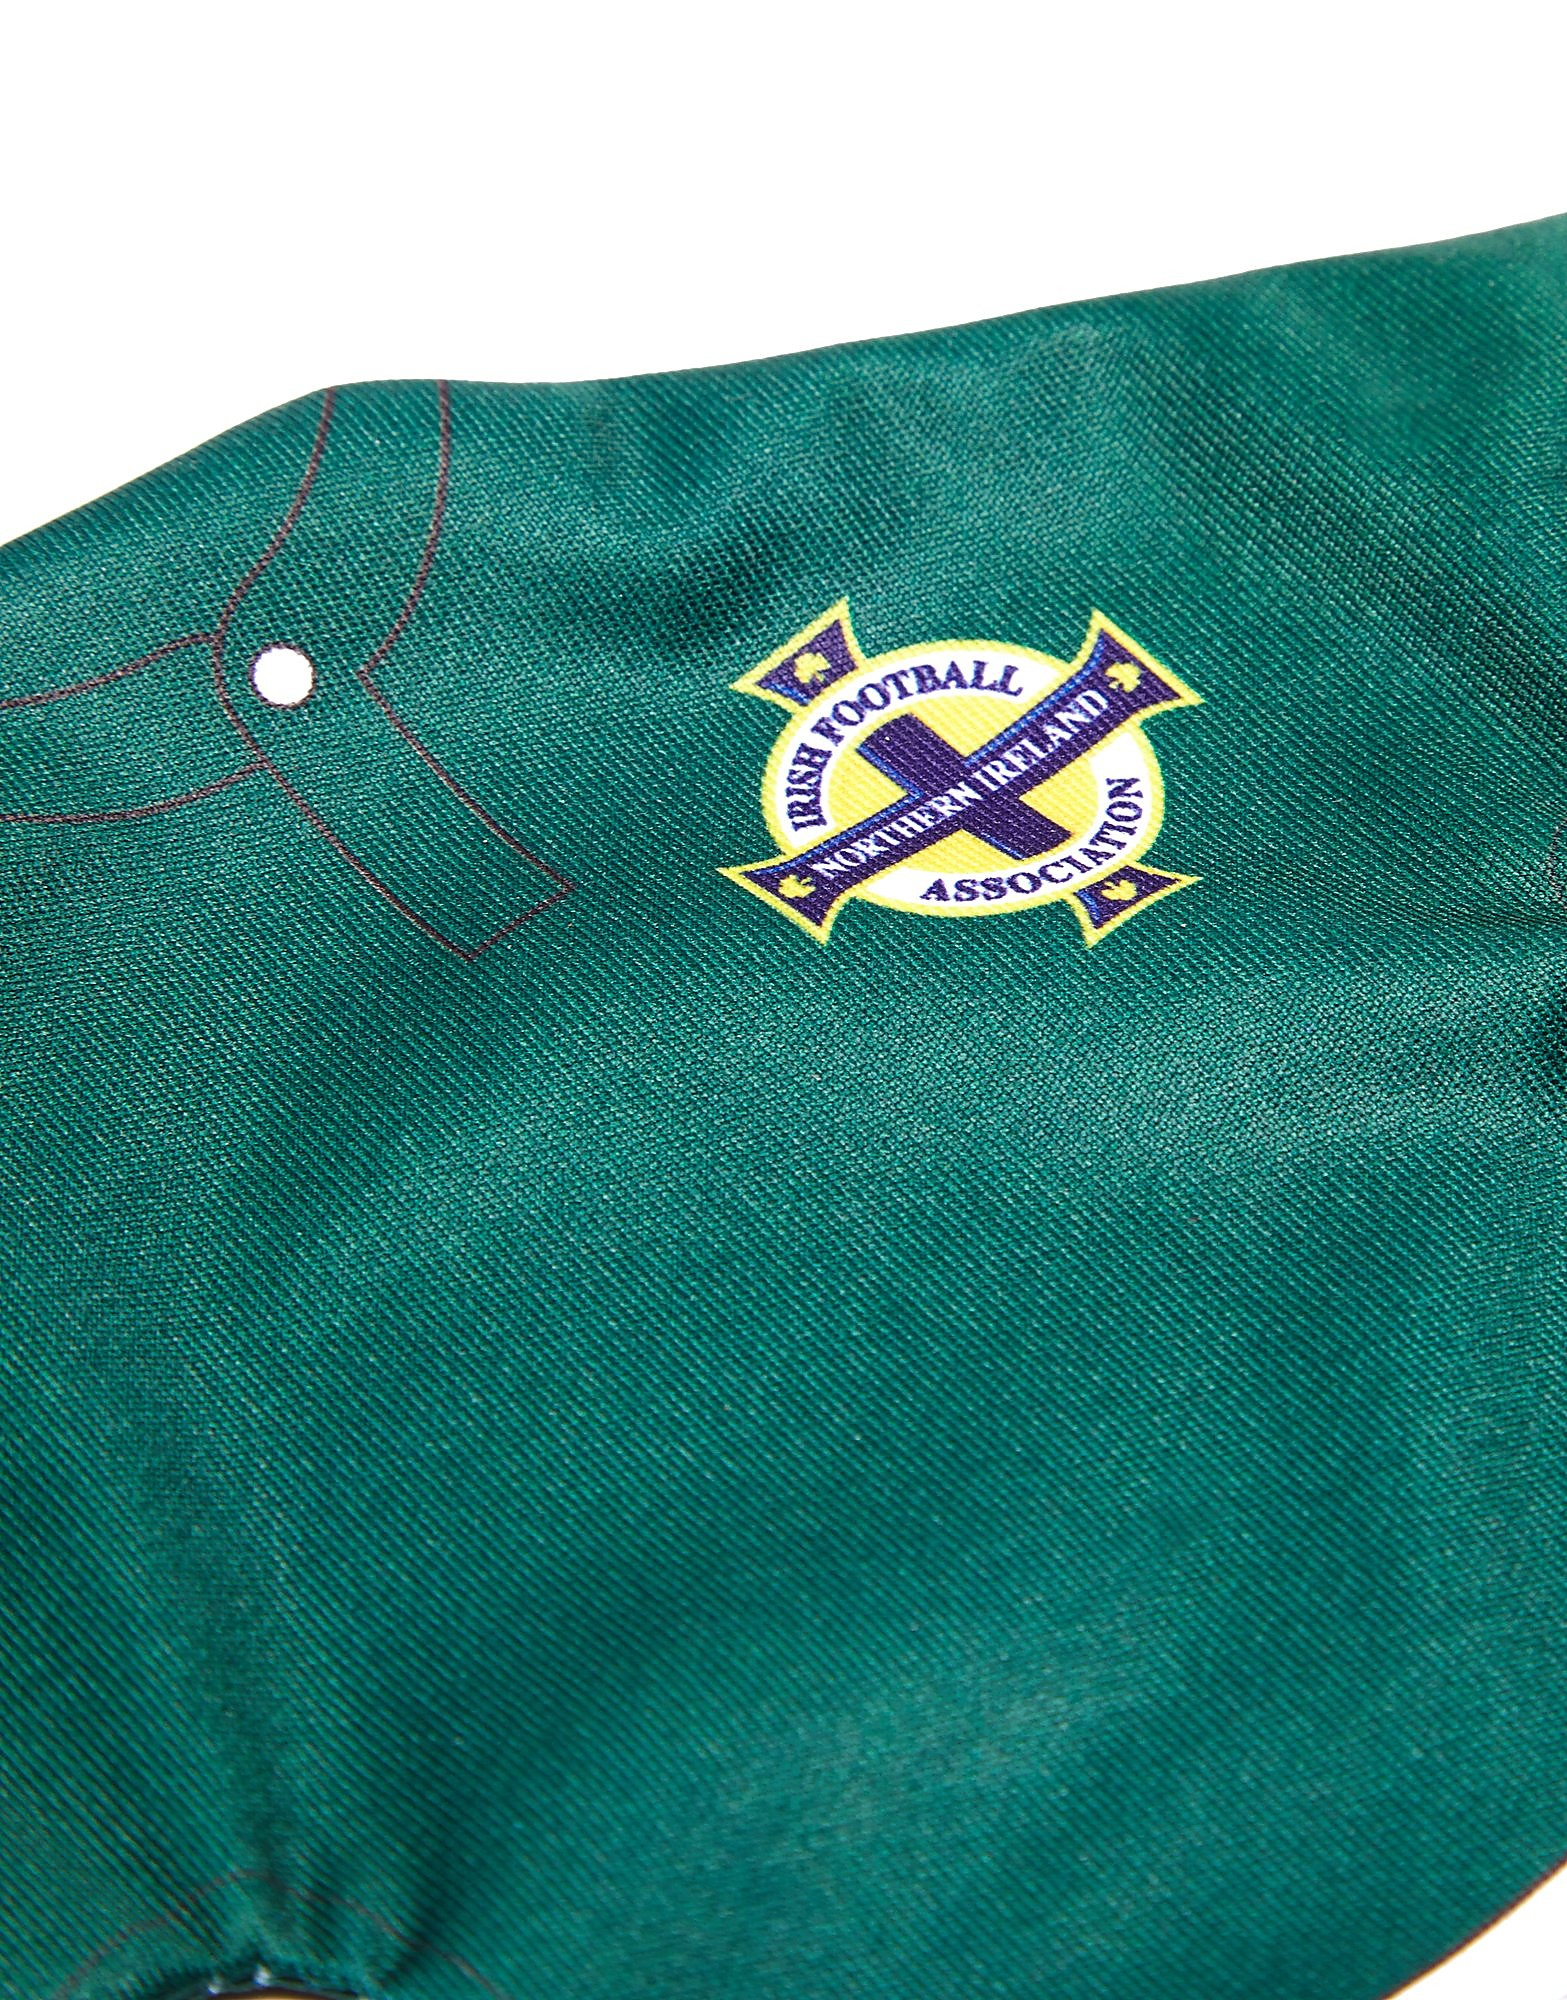 Official Team Northern Ireland Home Kit Coat Hanger